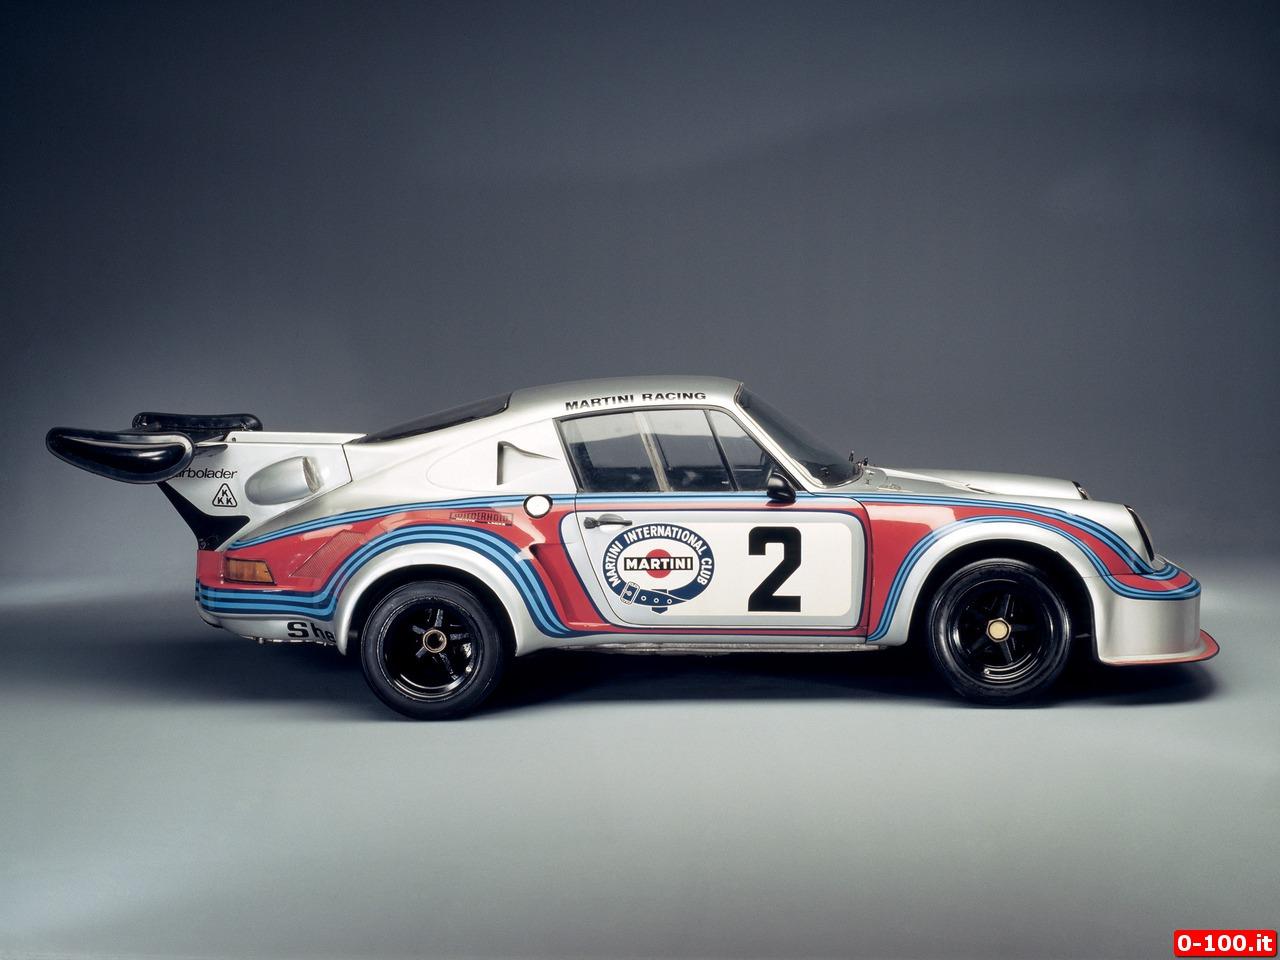 porsche_911-rsr-turbo-2100-1974_0-100